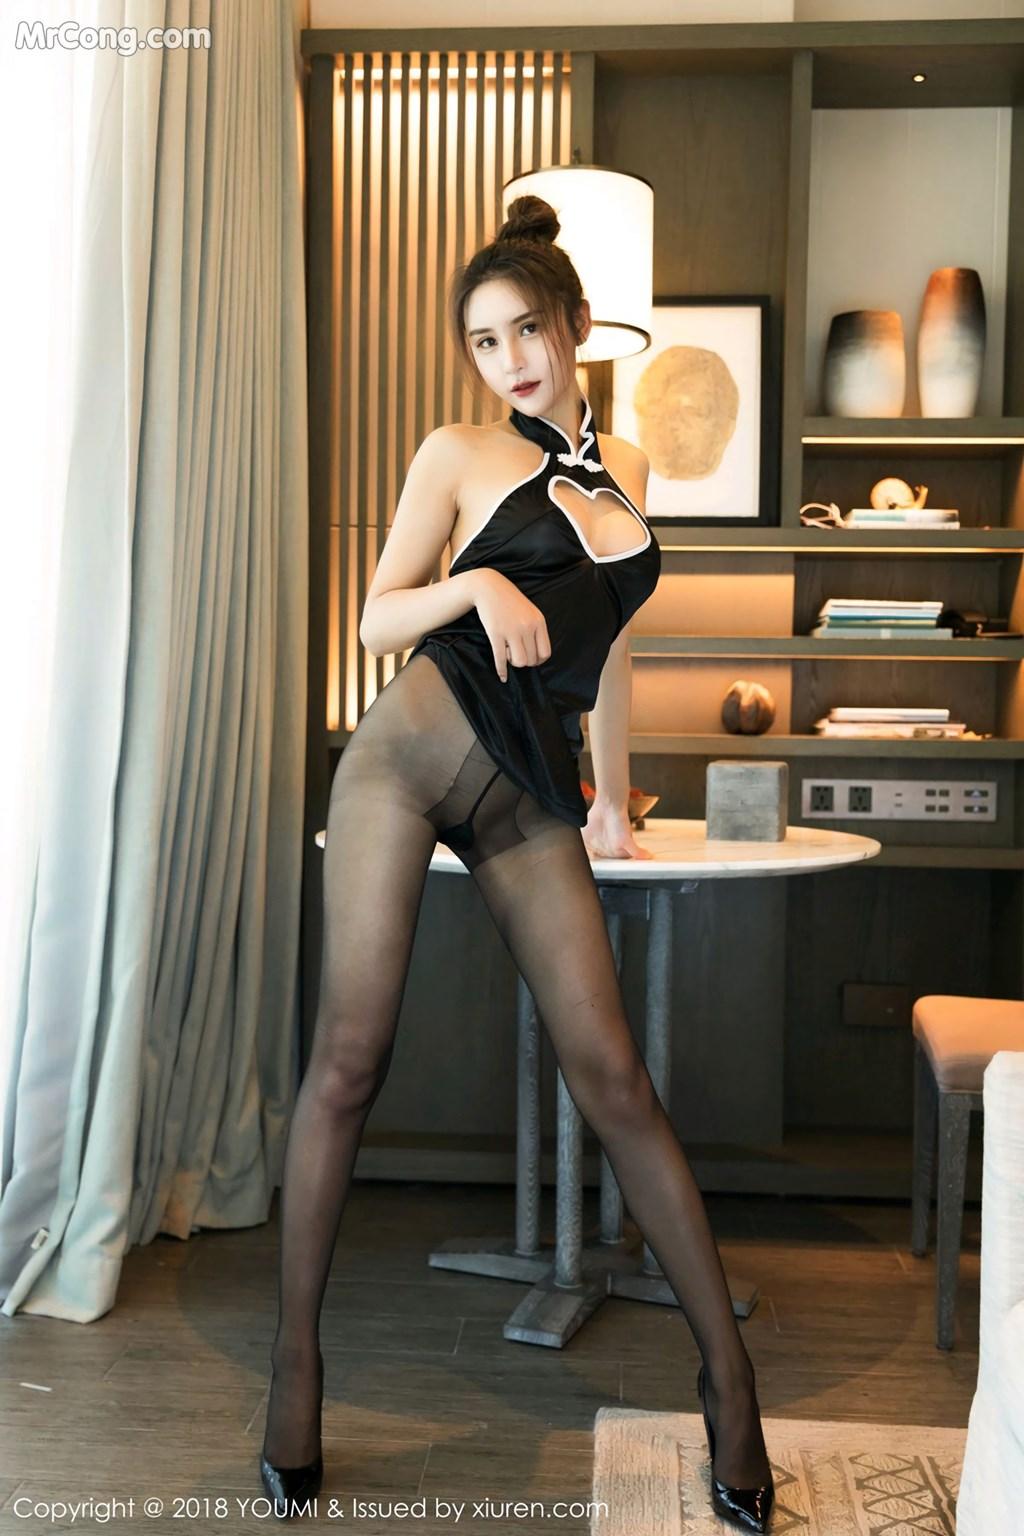 Image YouMi-Vol.233-SOLO-MrCong.com-001 in post YouMi Vol.233: Người mẫu SOLO-尹菲 (46 ảnh)